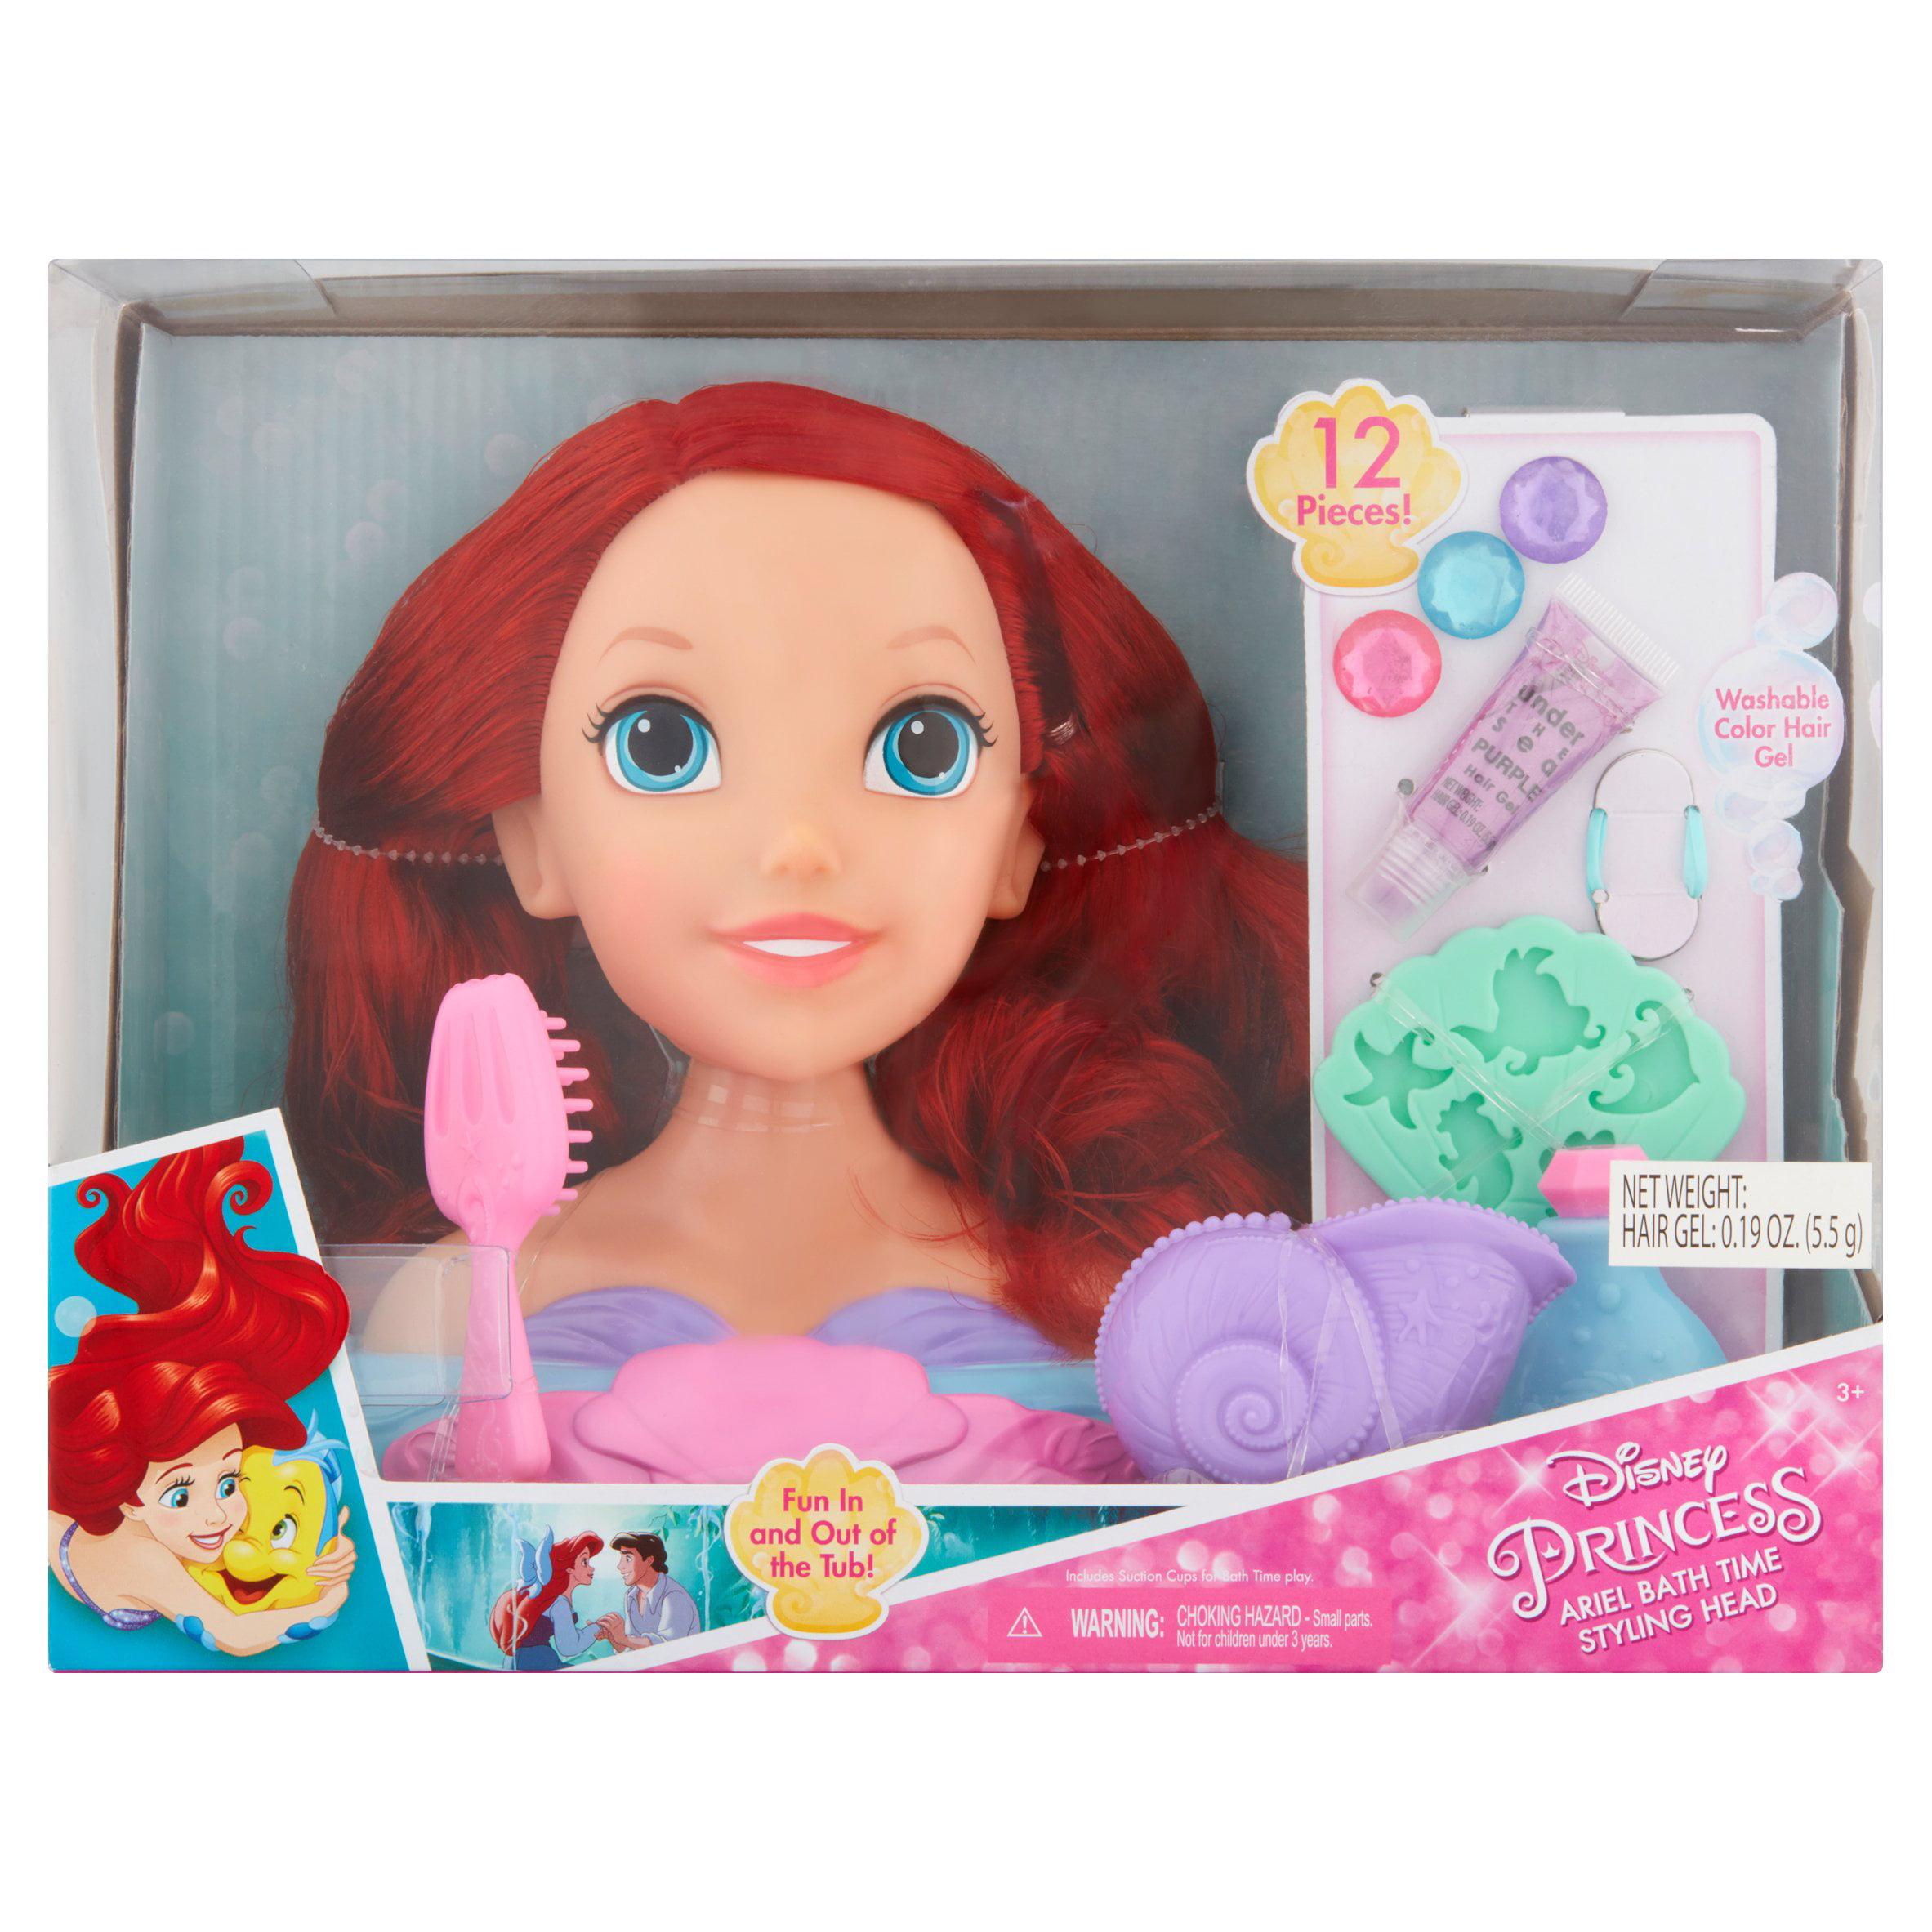 Disney Princess Ariel Bath Time Styling Head 3+ by Jakks Pacific, Inc.